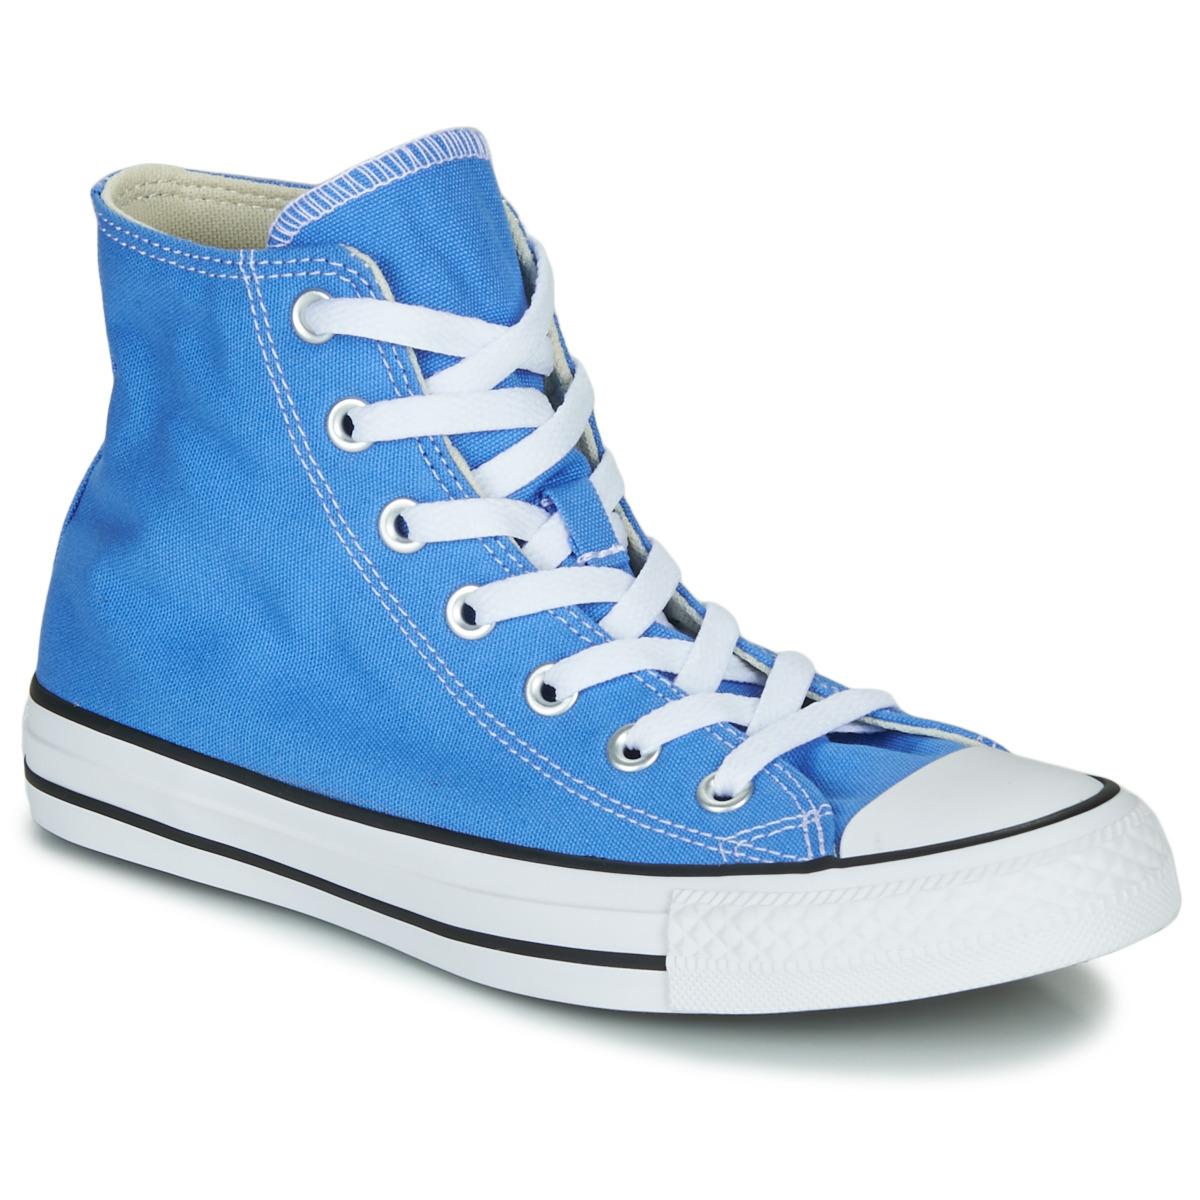 converse all star blu donna